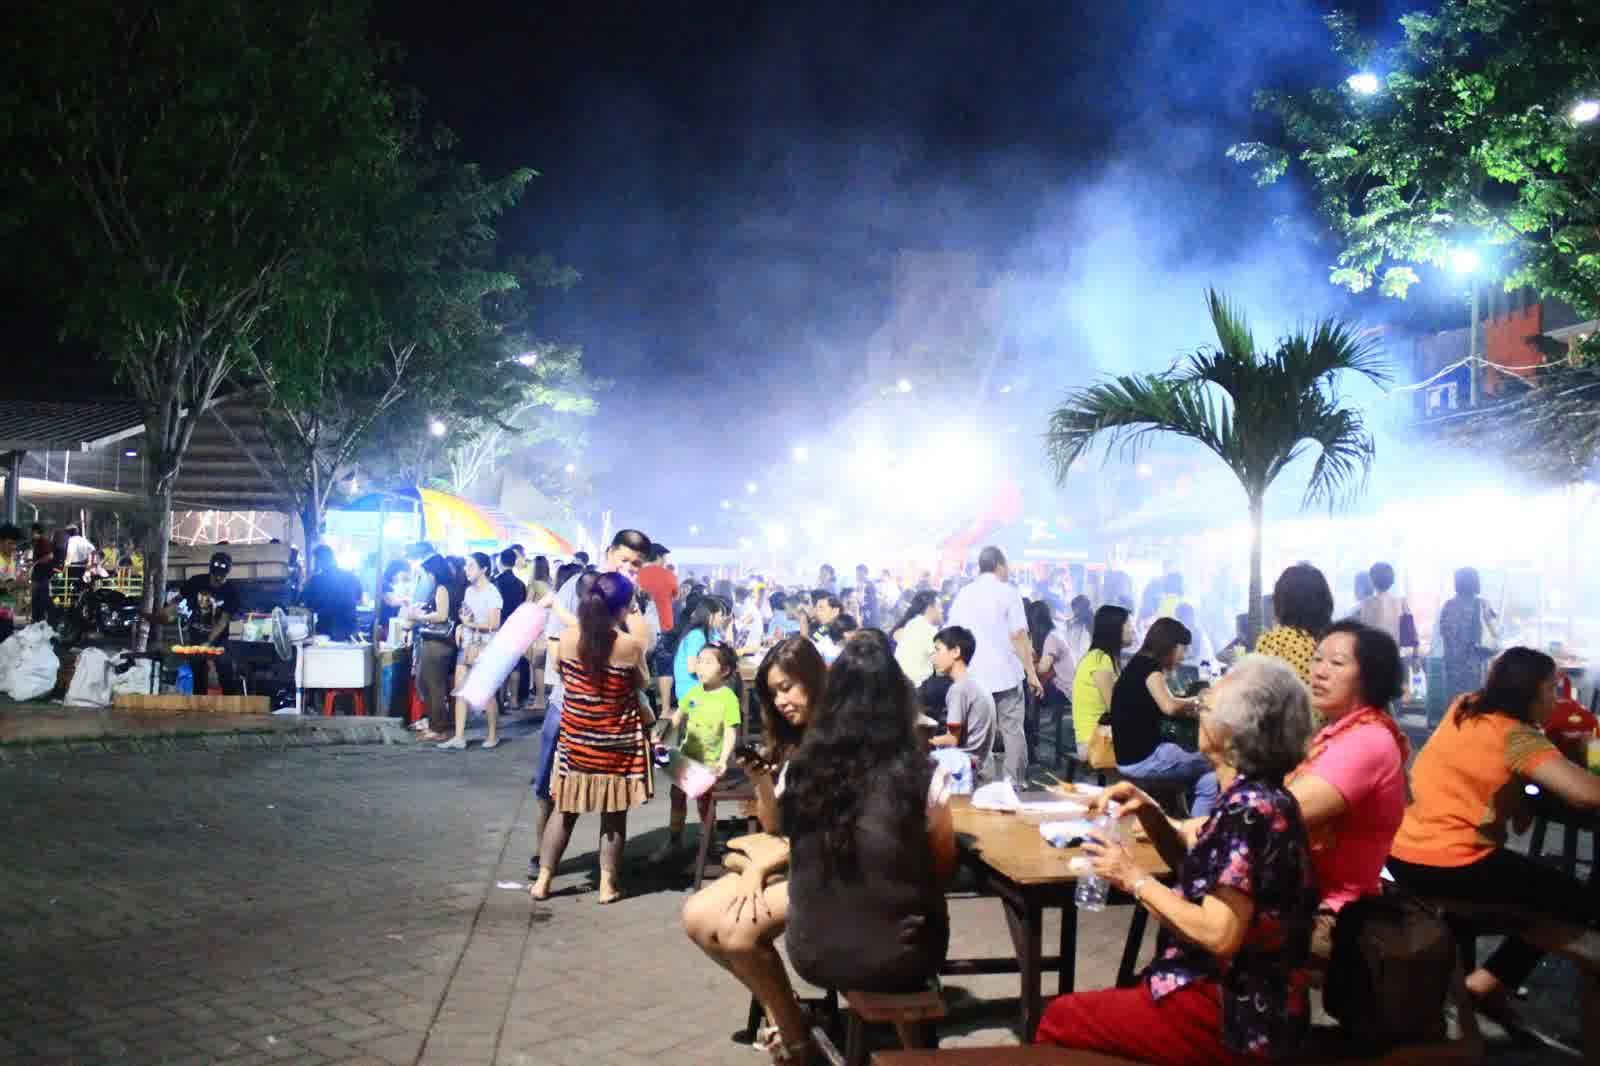 29 Wisata Malam Surabaya Tempat Hunting Nongkrong Dan Belajar